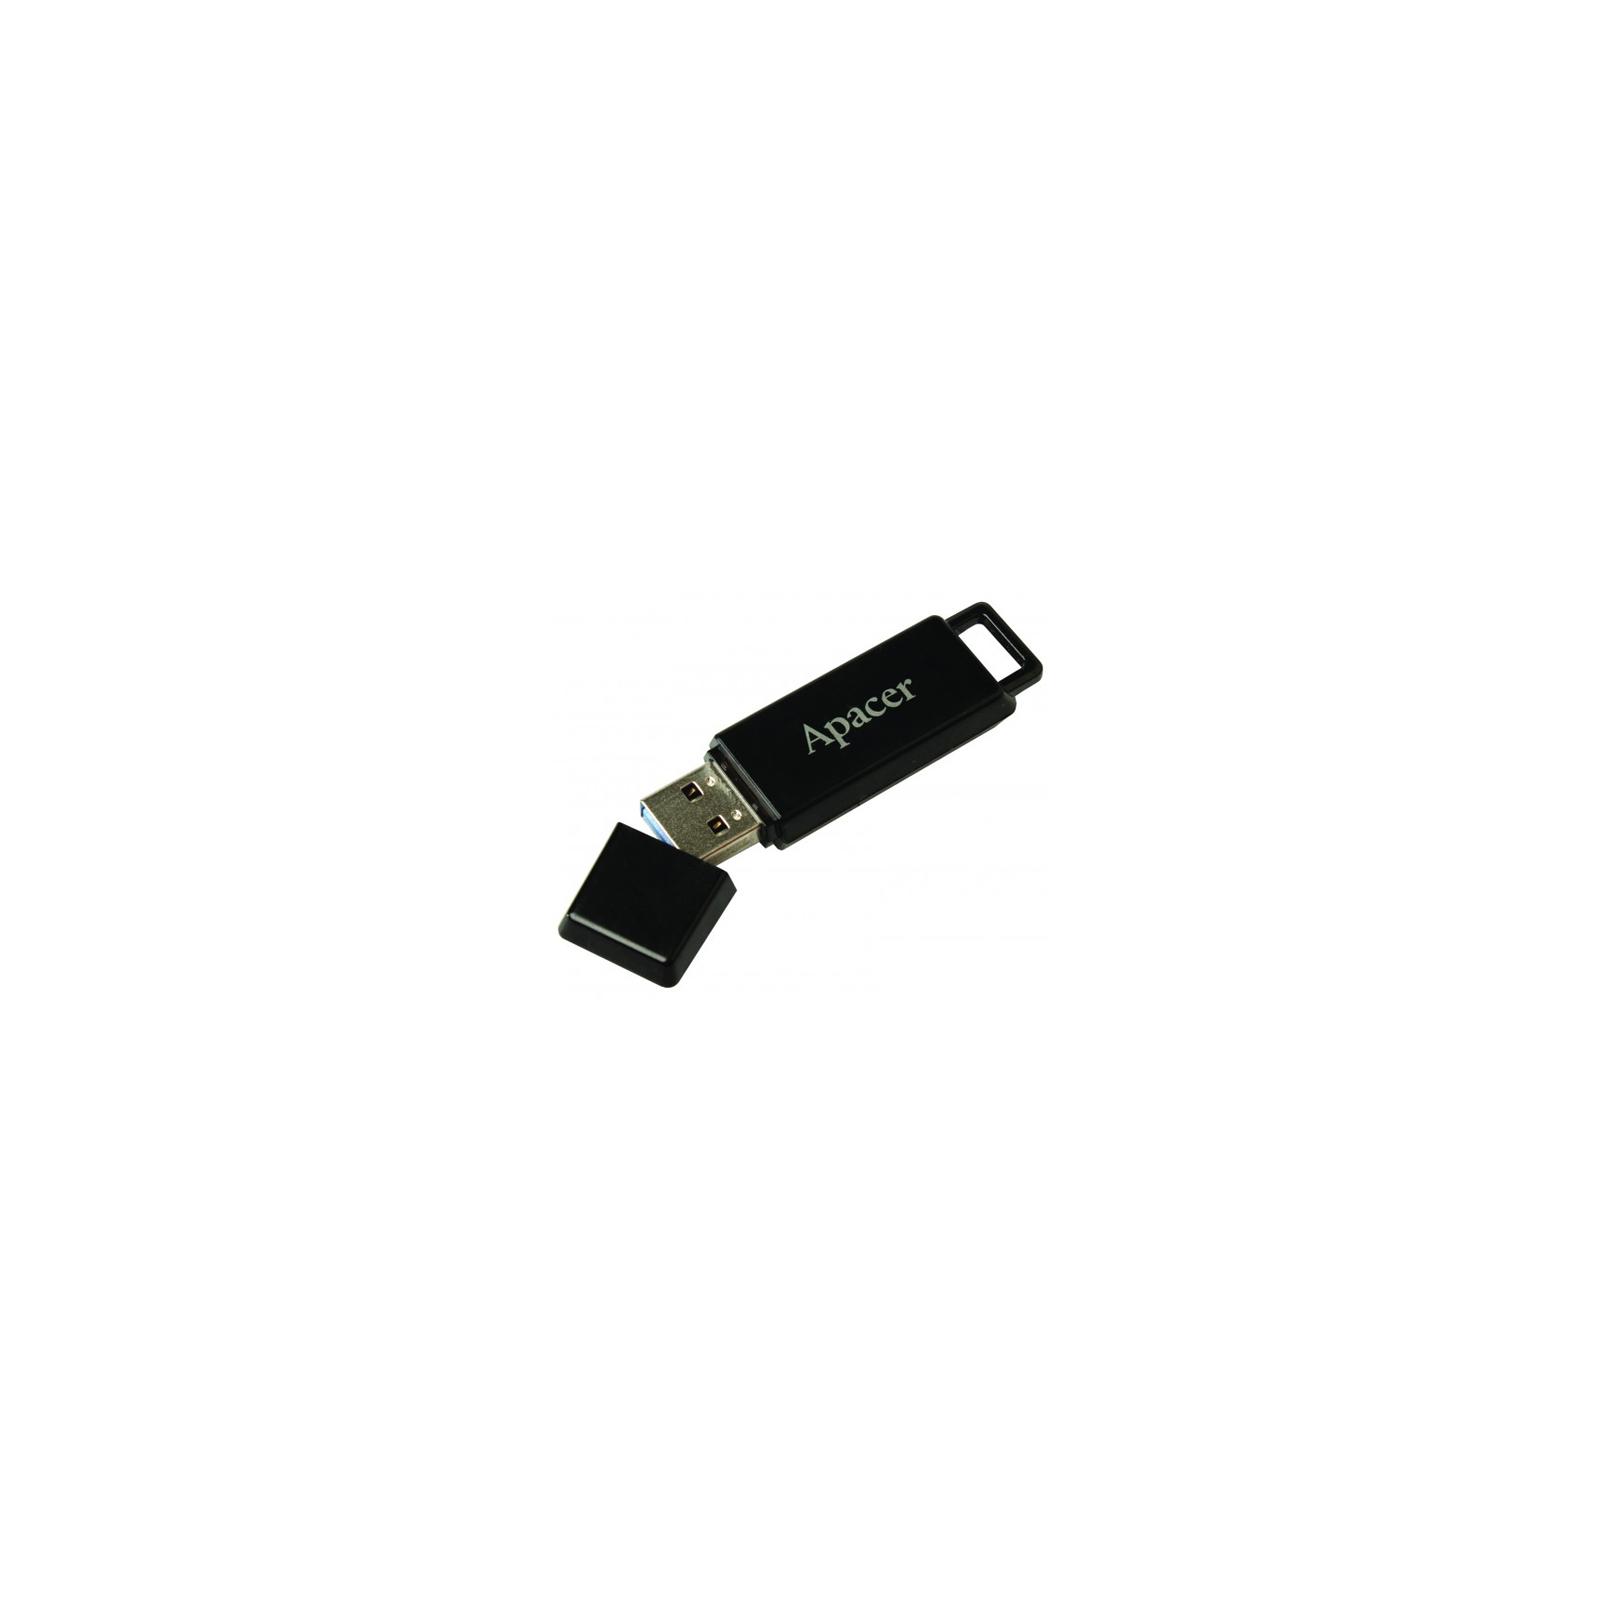 USB флеш накопитель 32GB AH352 Black RP USB3.0 Apacer (AP32GAH352B-1) изображение 4